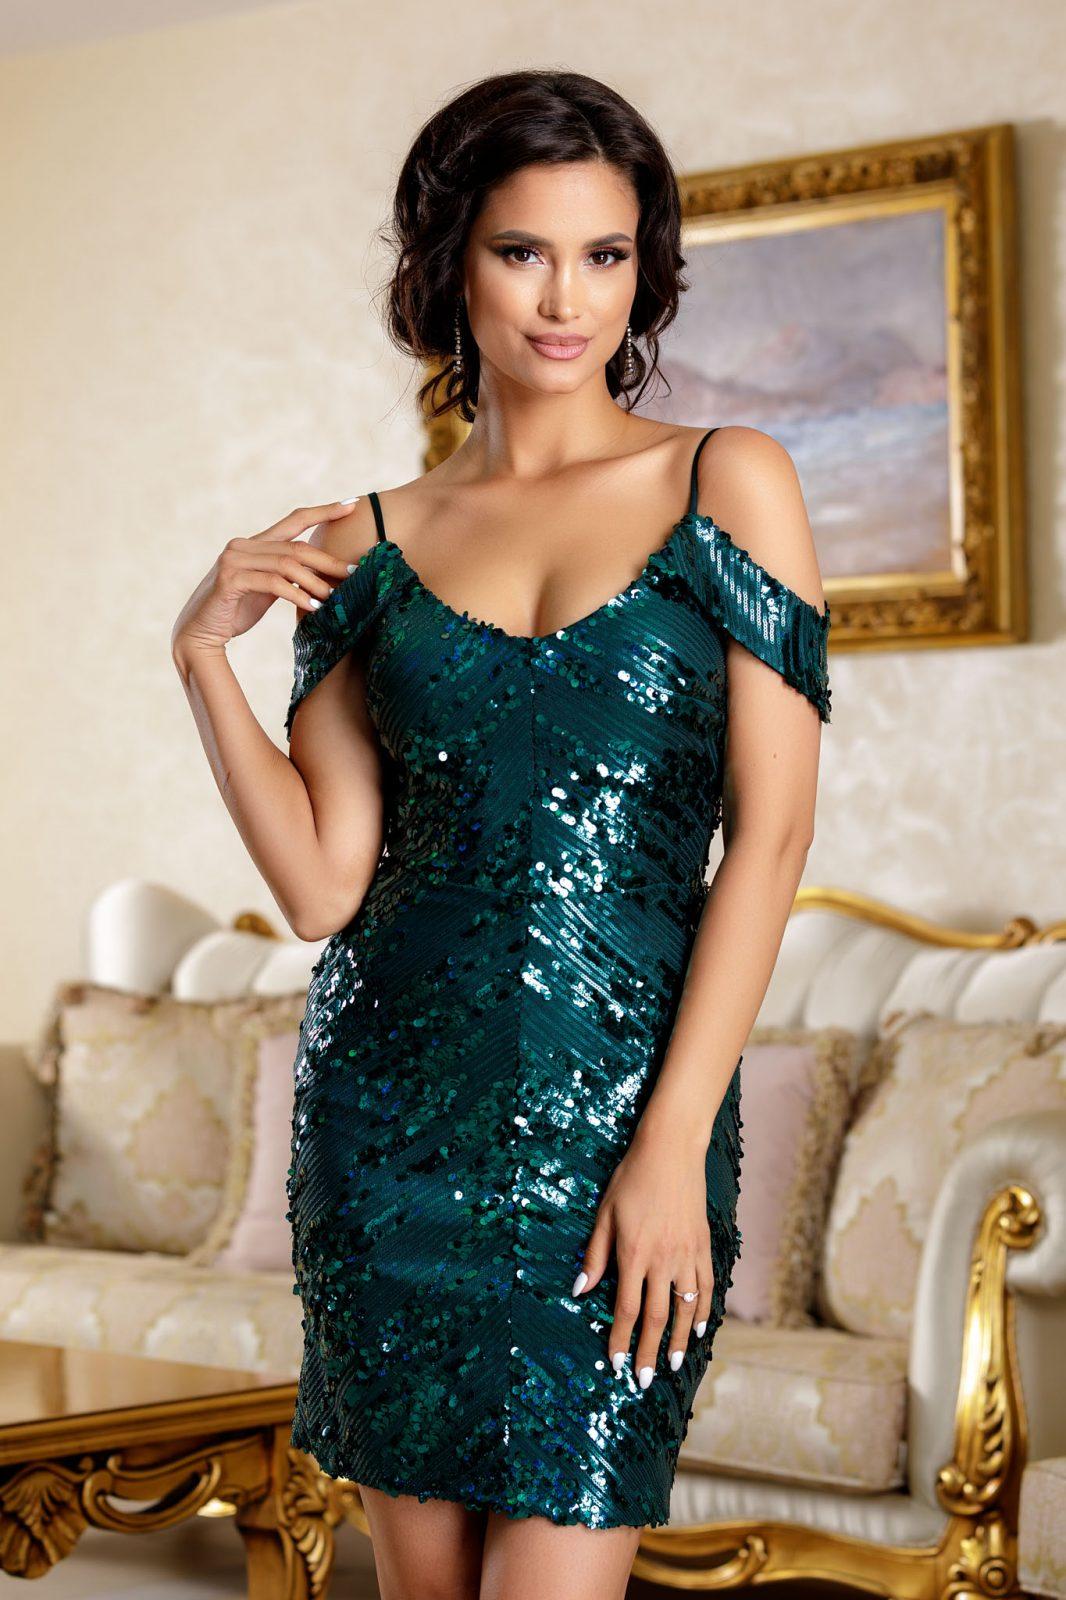 Noemya Green Dress